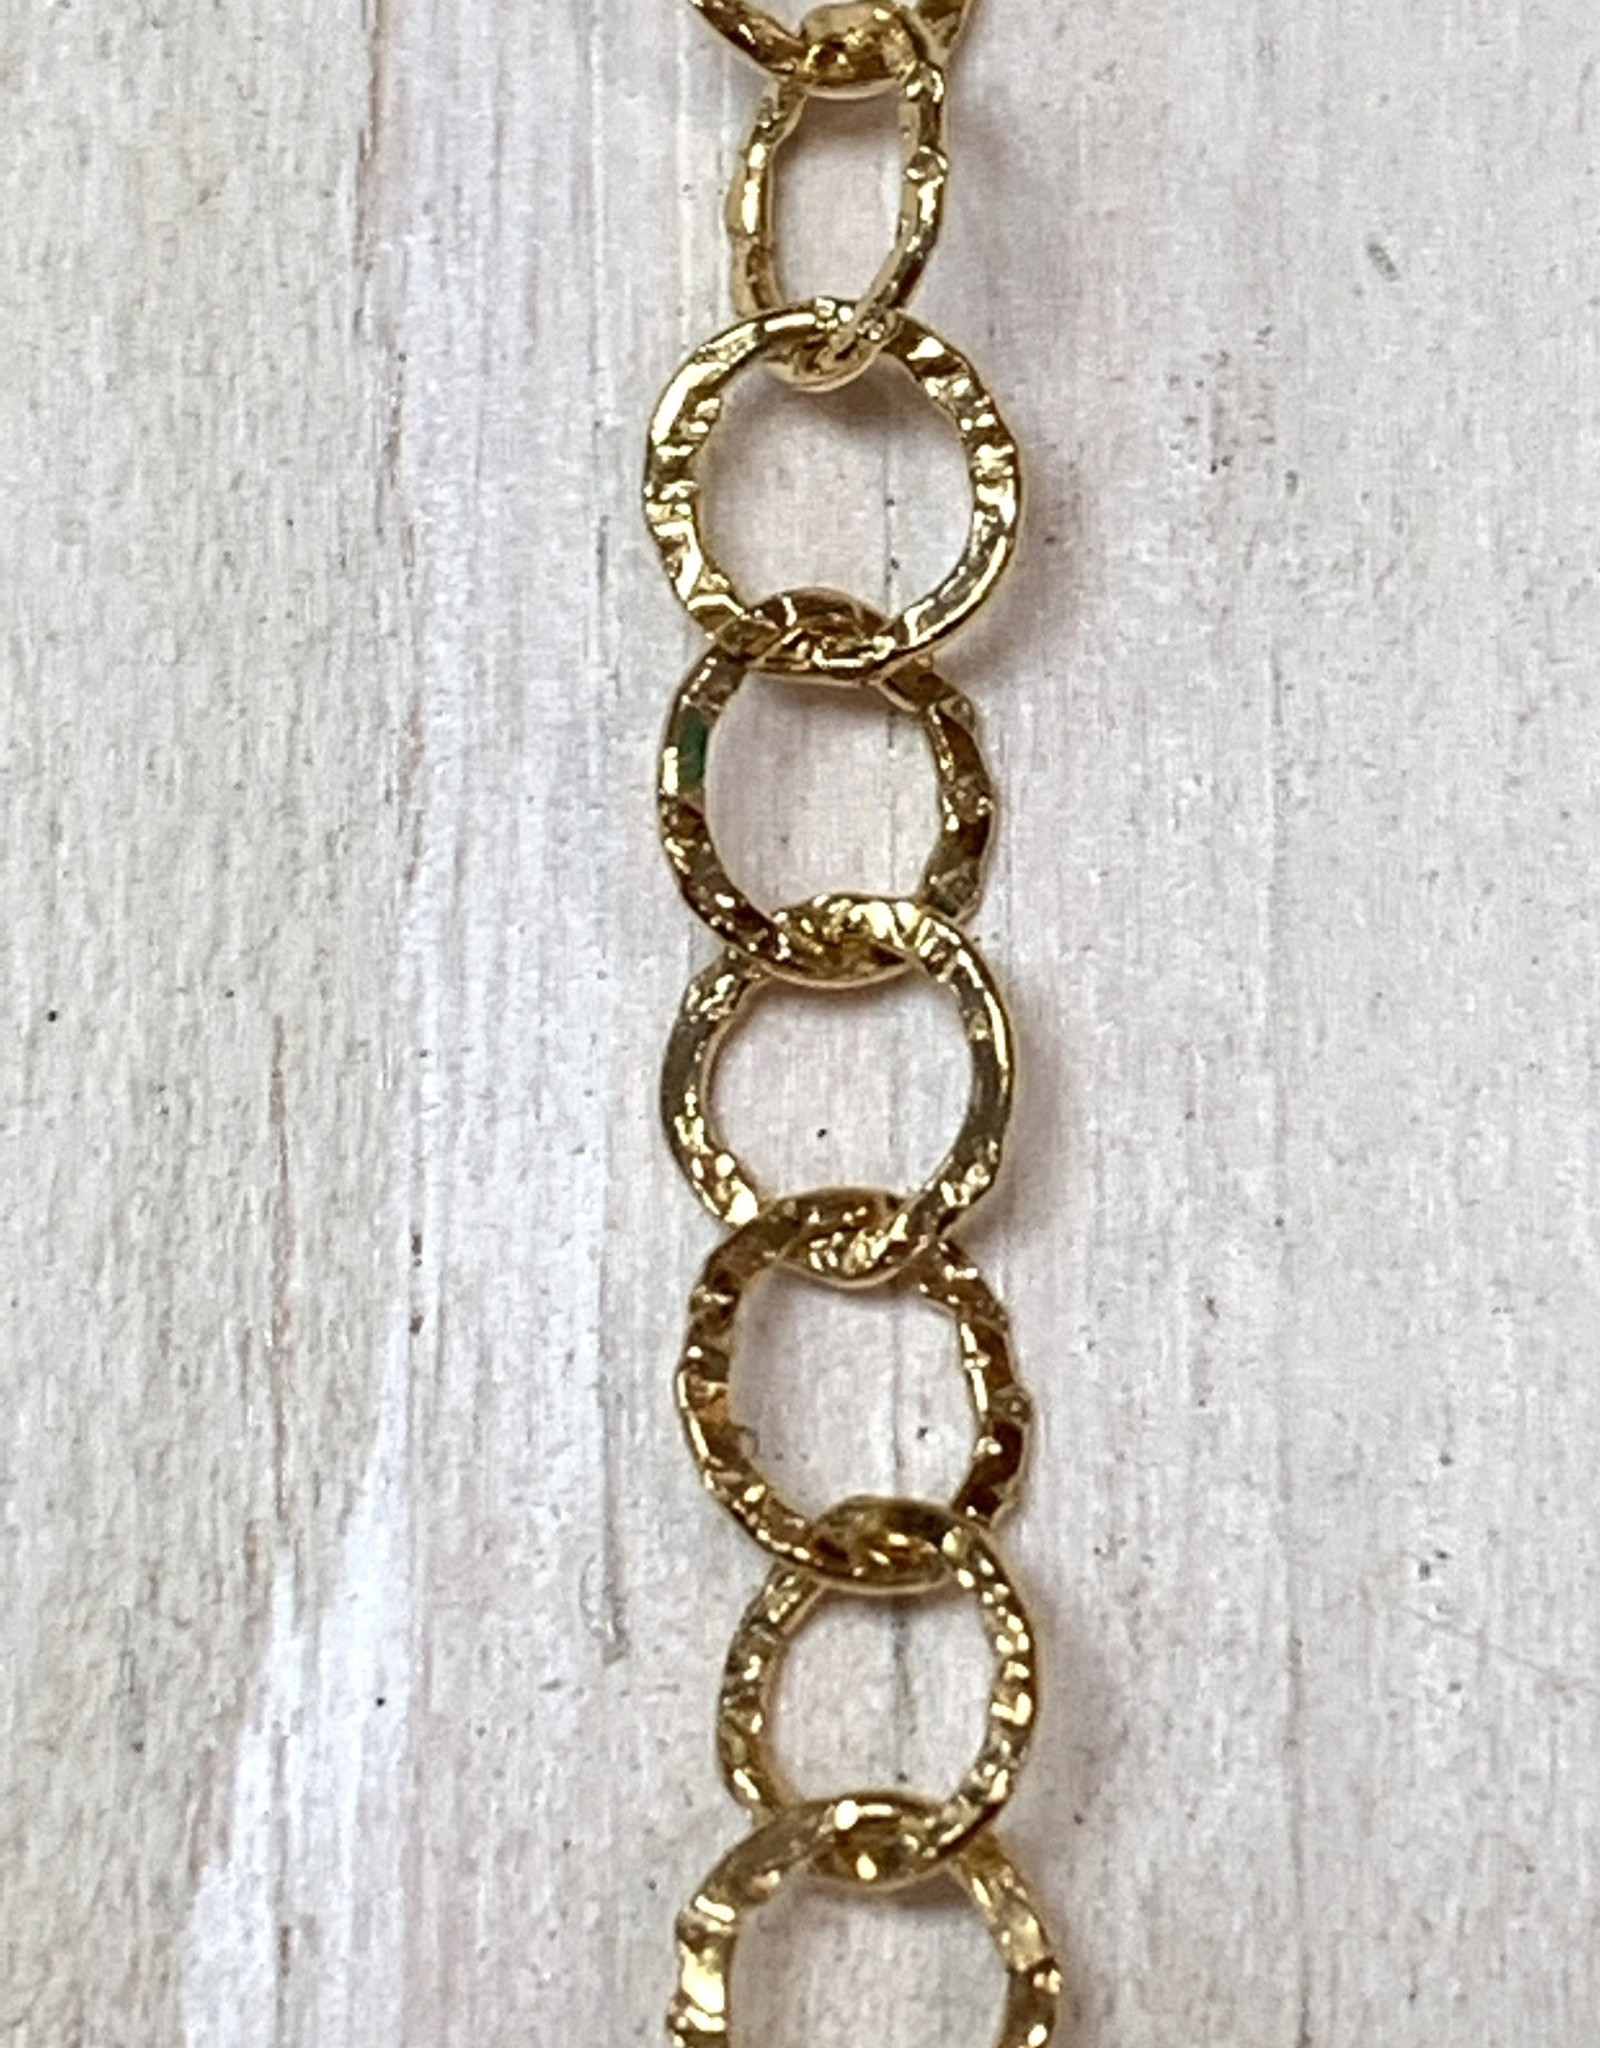 5mm Round Hammered Chain 14k Gold Filled Inch